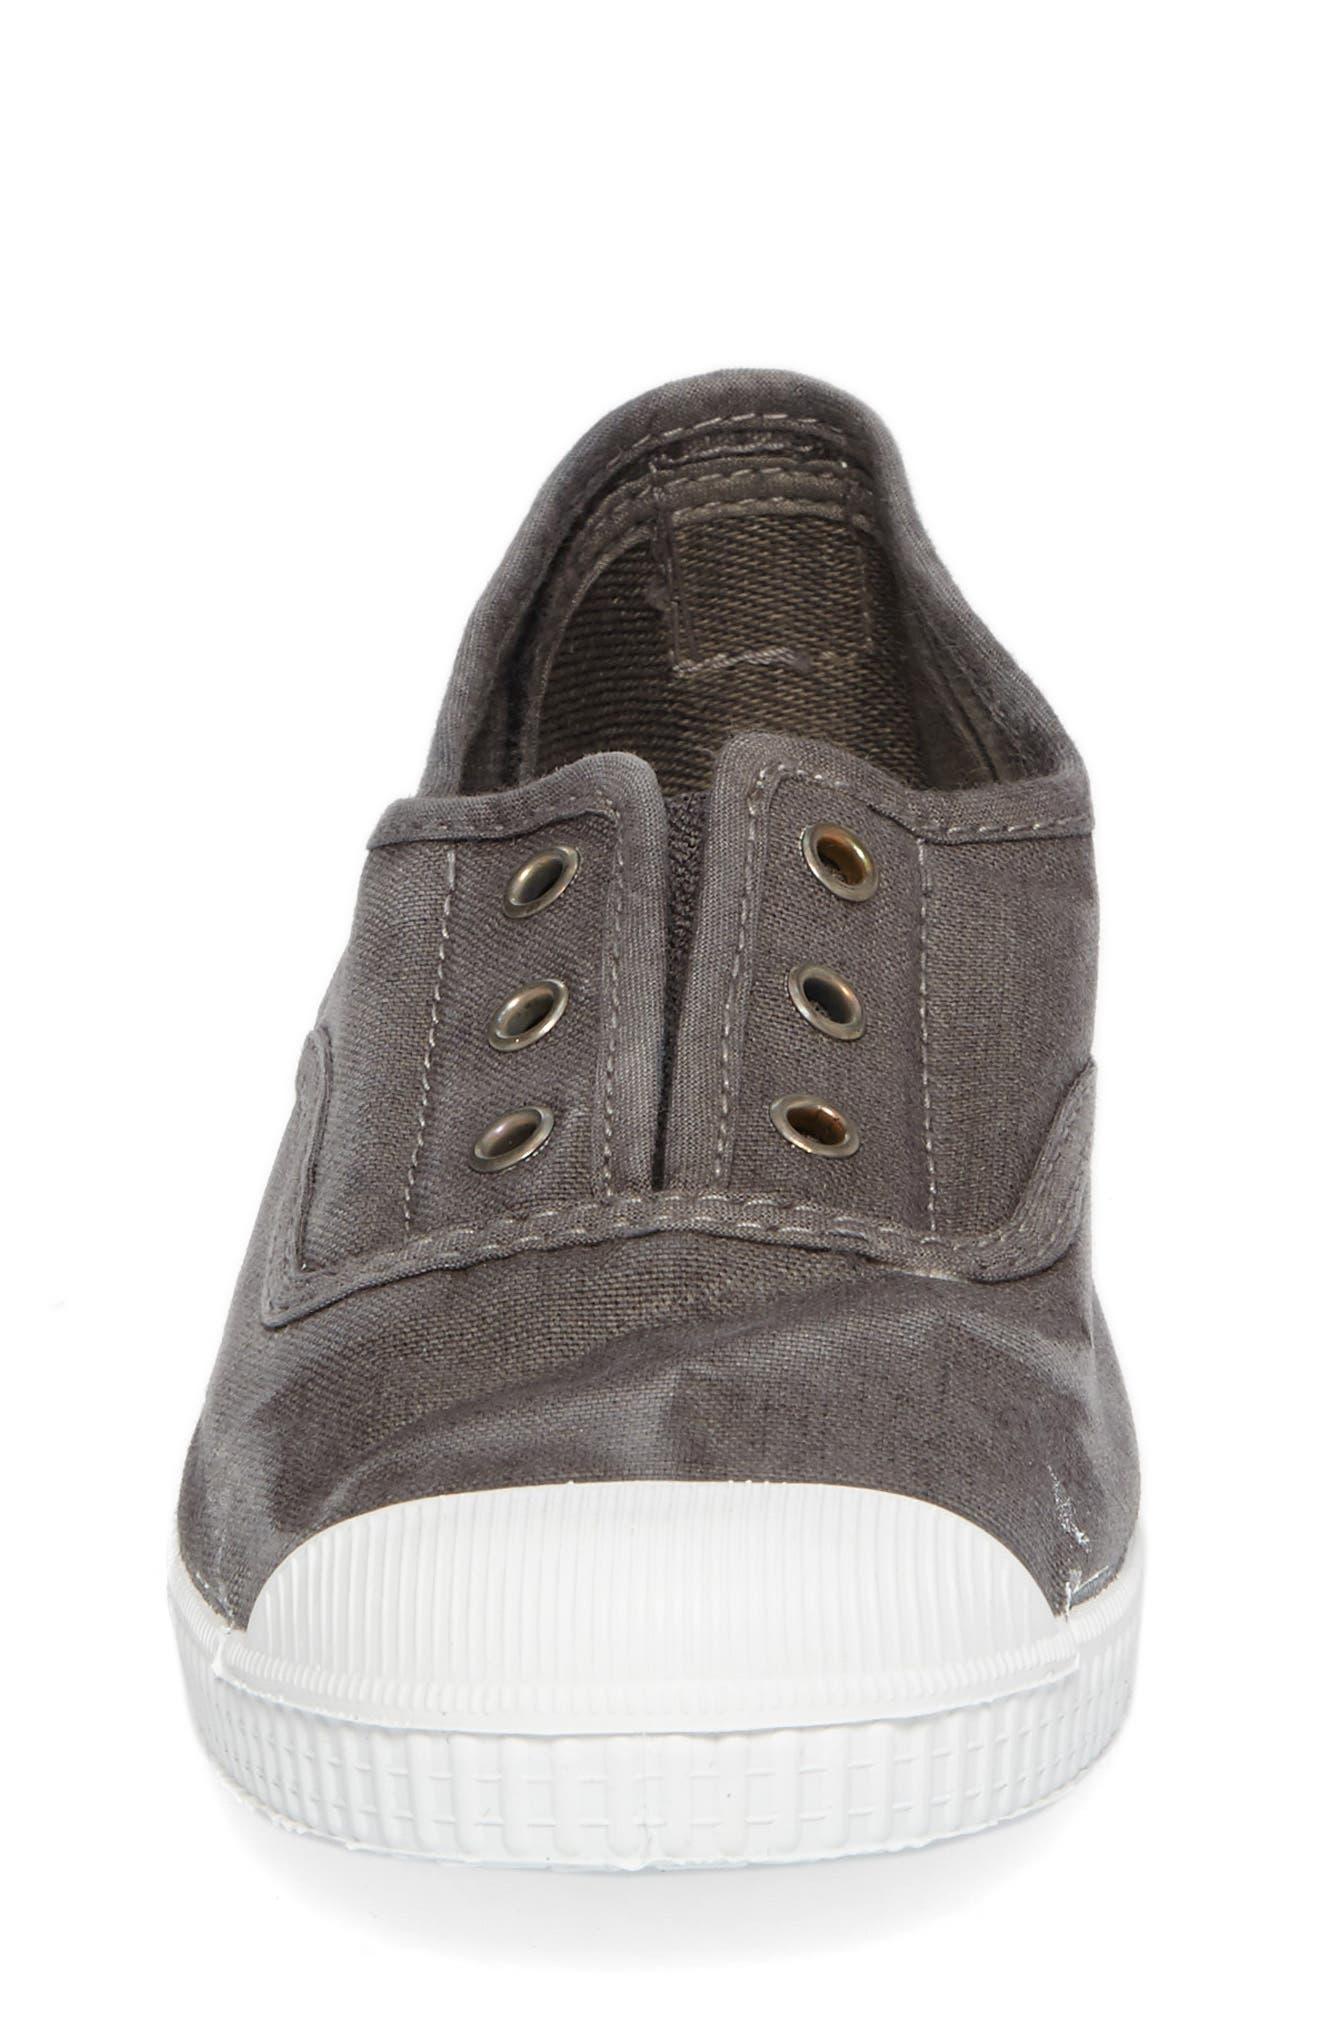 Alternate Image 4  - Cienta Laceless Slip-On Sneaker (Walker, Toddler, Little Kid & Big Kid)